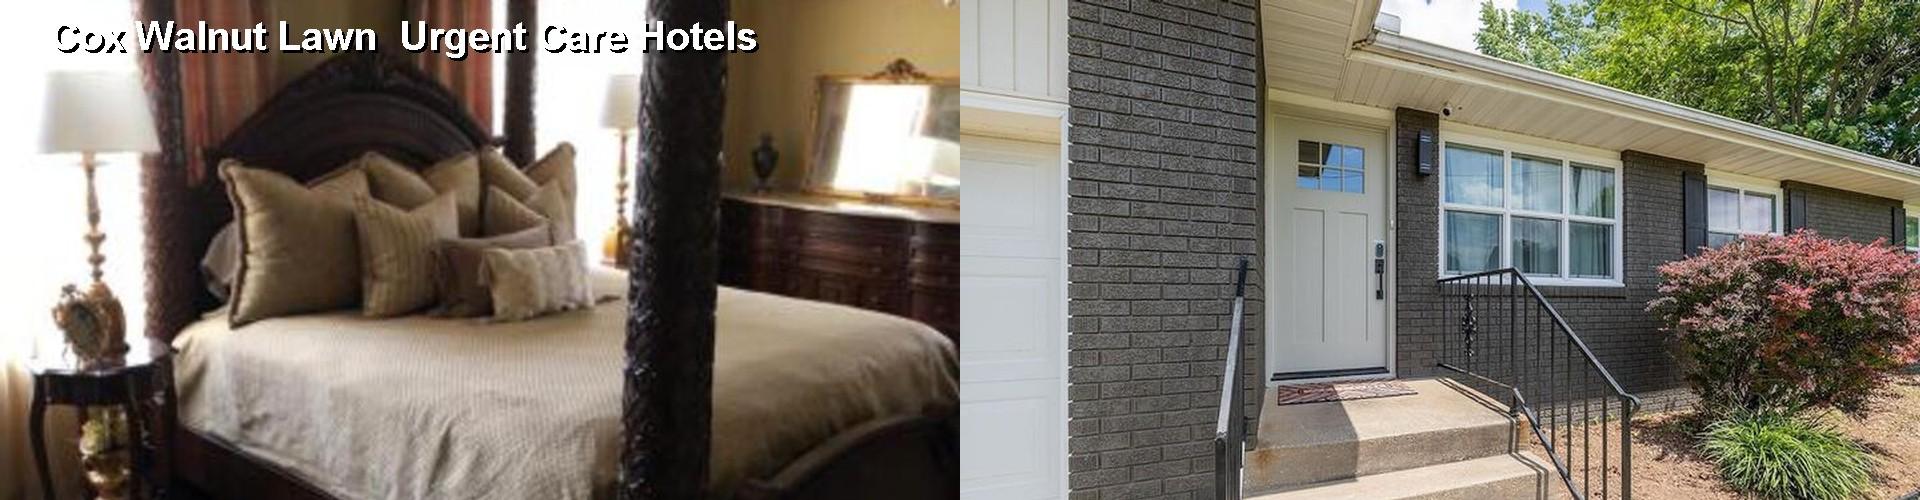 39 Hotels Near Cox Walnut Lawn Urgent Care In Springfield Mo